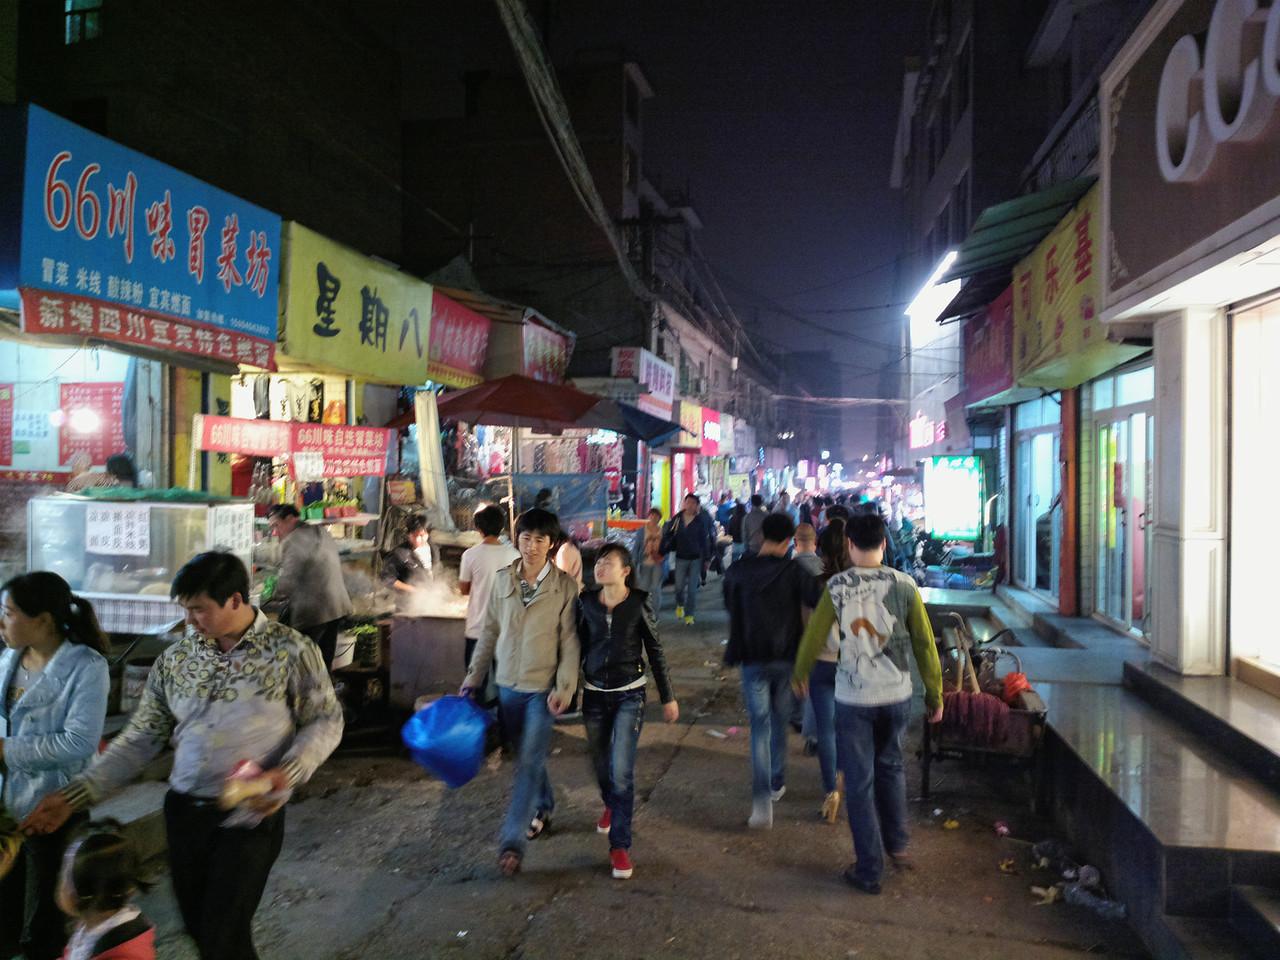 20130506_2040_0106 YangJiaCun Road (杨家村路) night-market